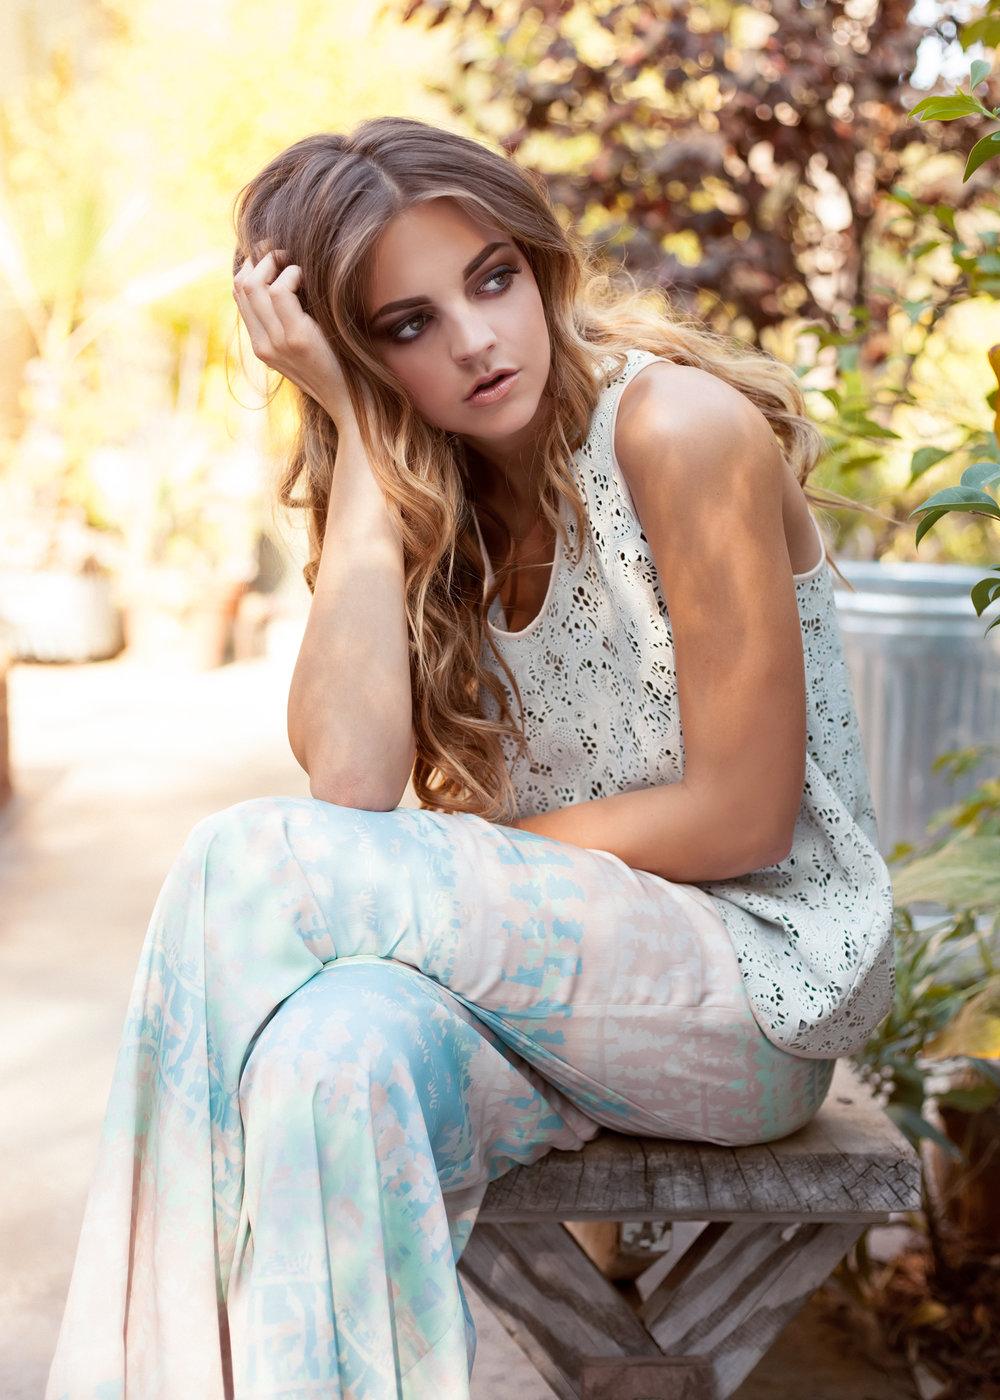 JessicaFaulkner-SS14_005.jpg